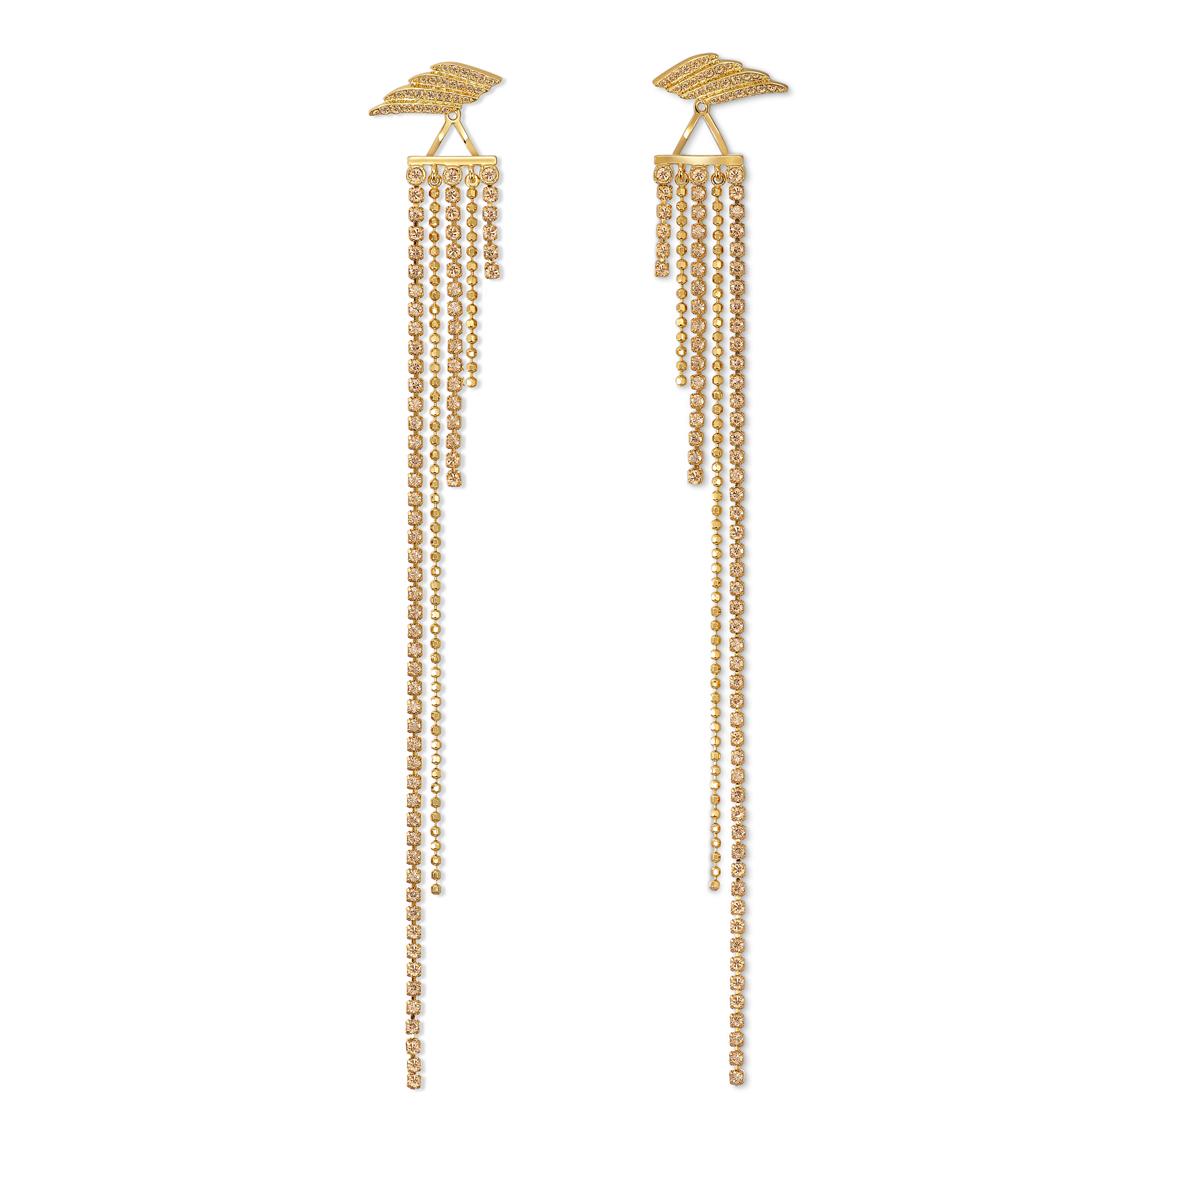 Swarovski Warner Bros. Fit WW Pierced Earrings Tassels Crystal Mix